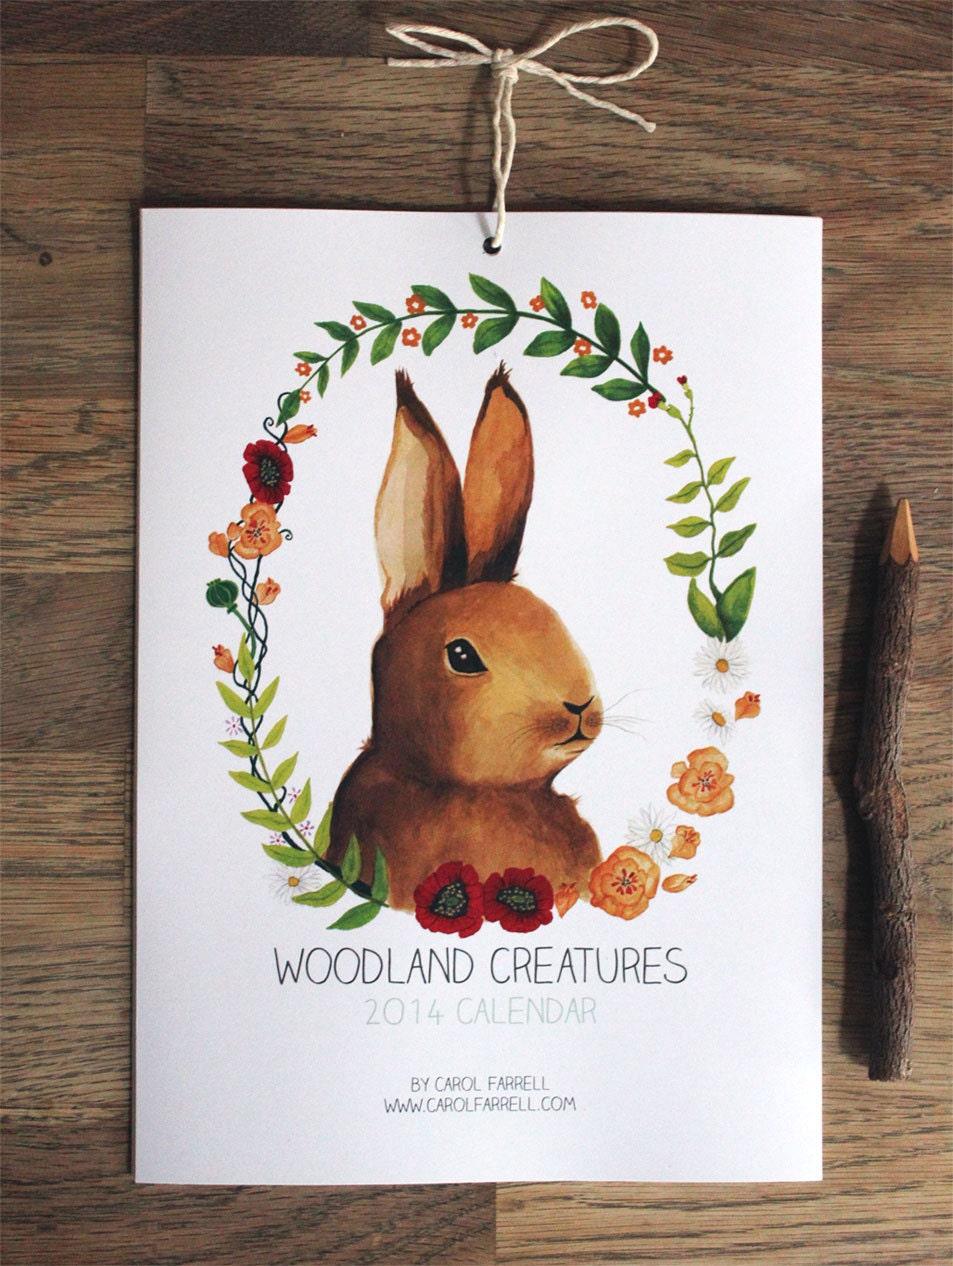 Woodland Creatures 2014 Calendar